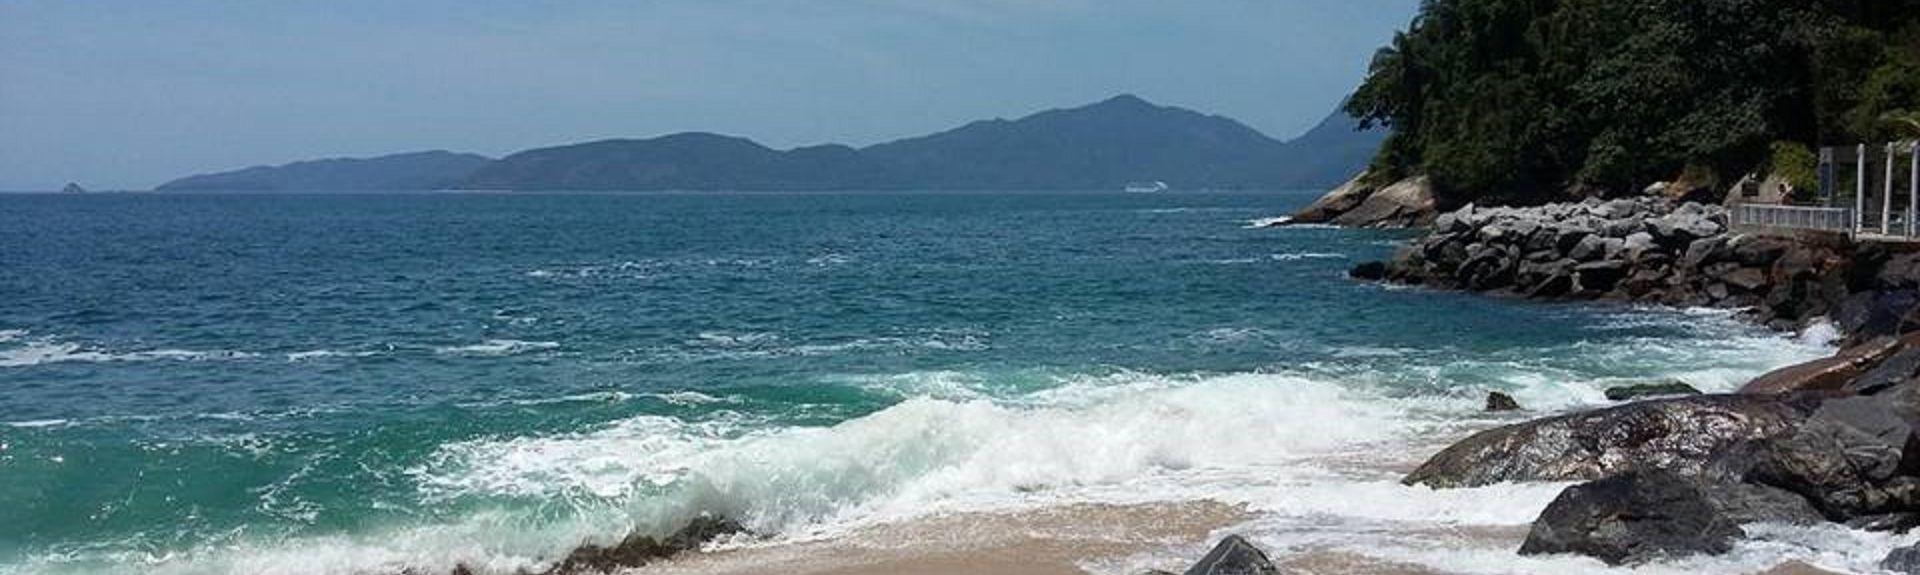 Ibicui Beach, Mangaratiba, State of Rio de Janeiro, BR